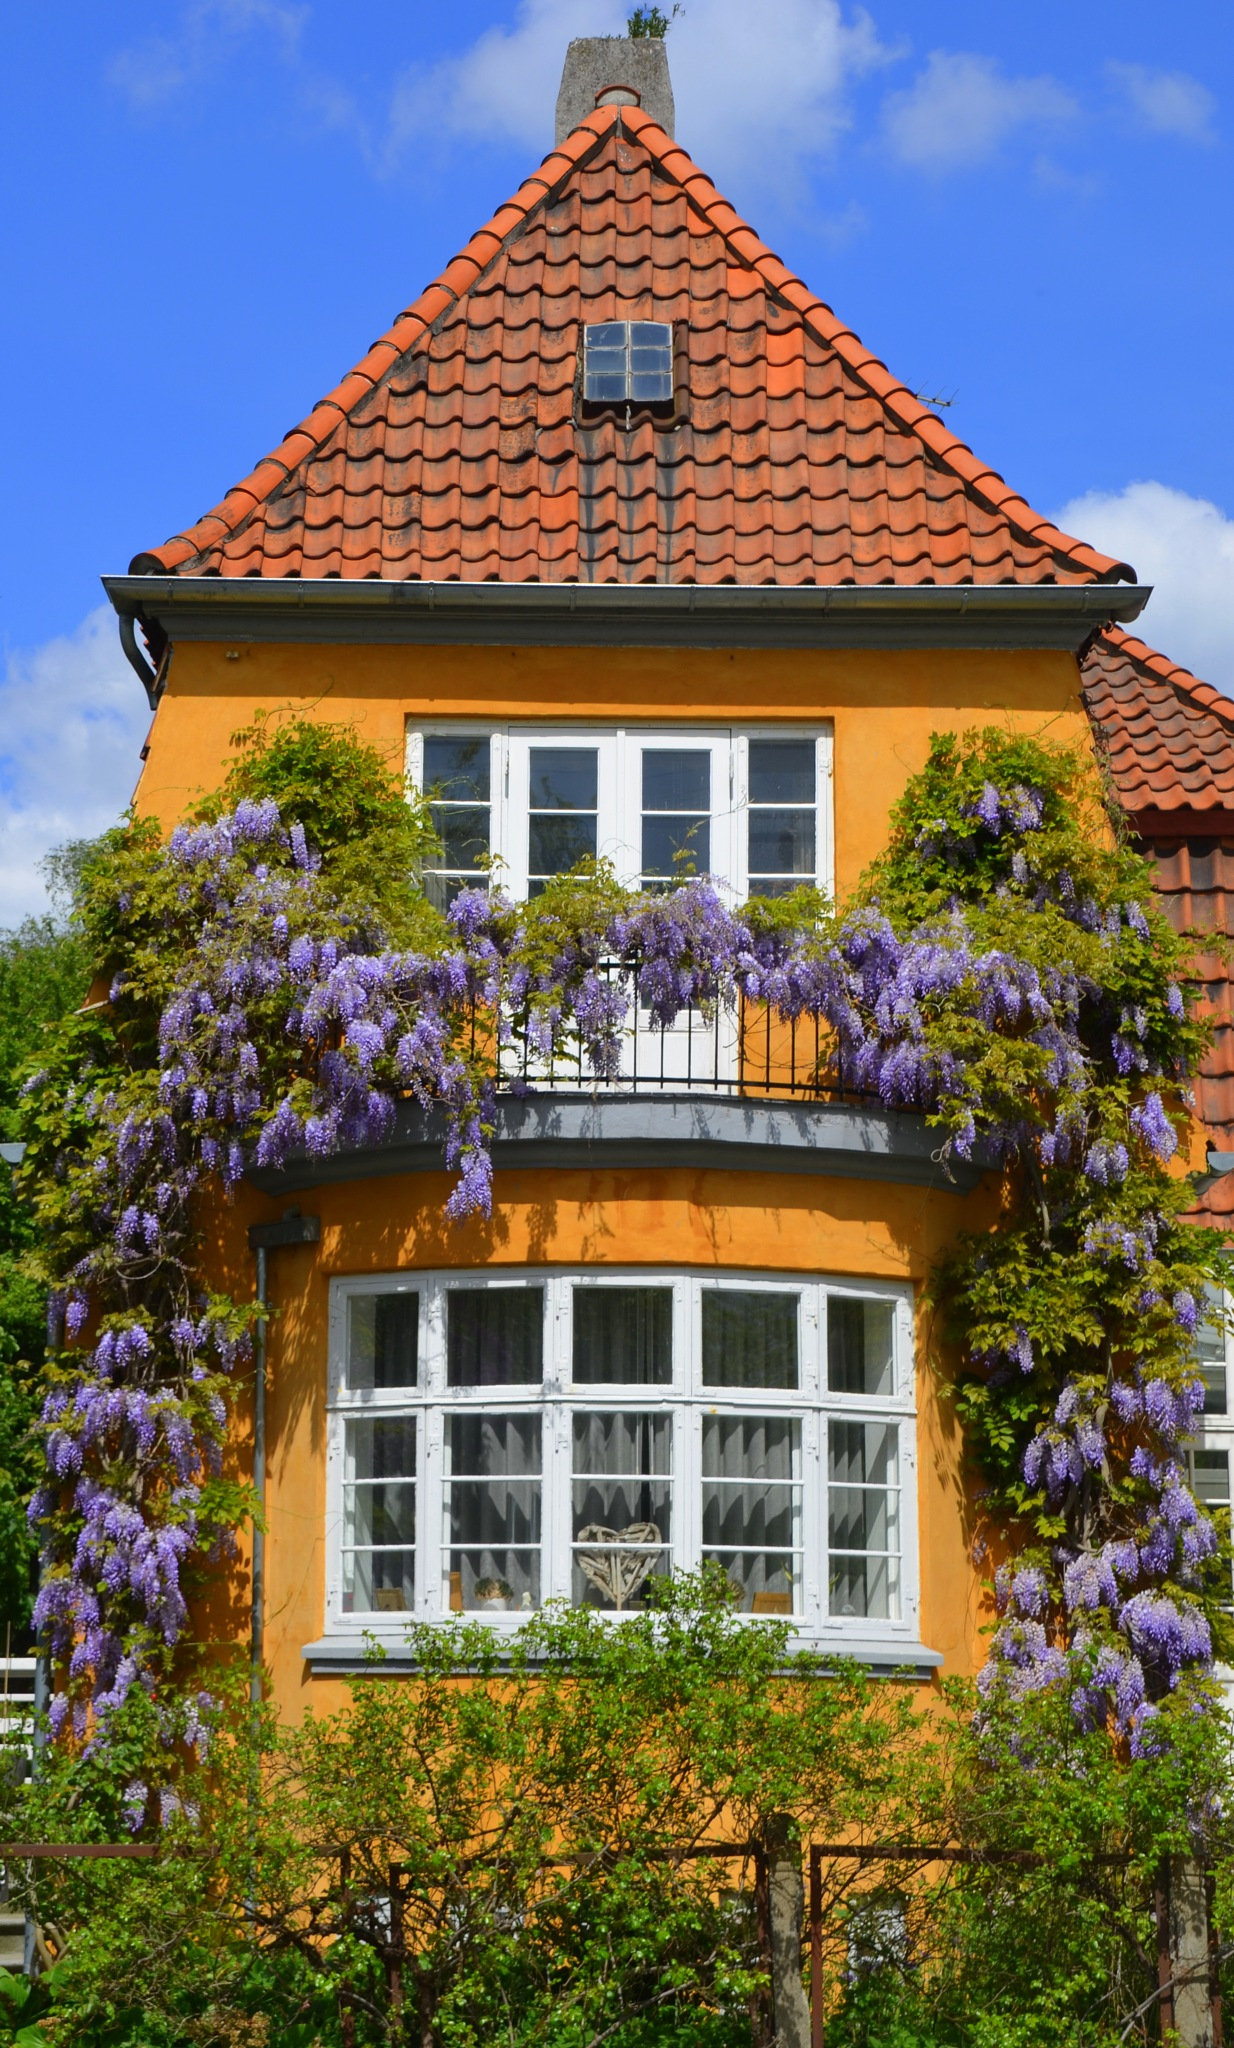 Springtime in Denmark by KinneBPhoto